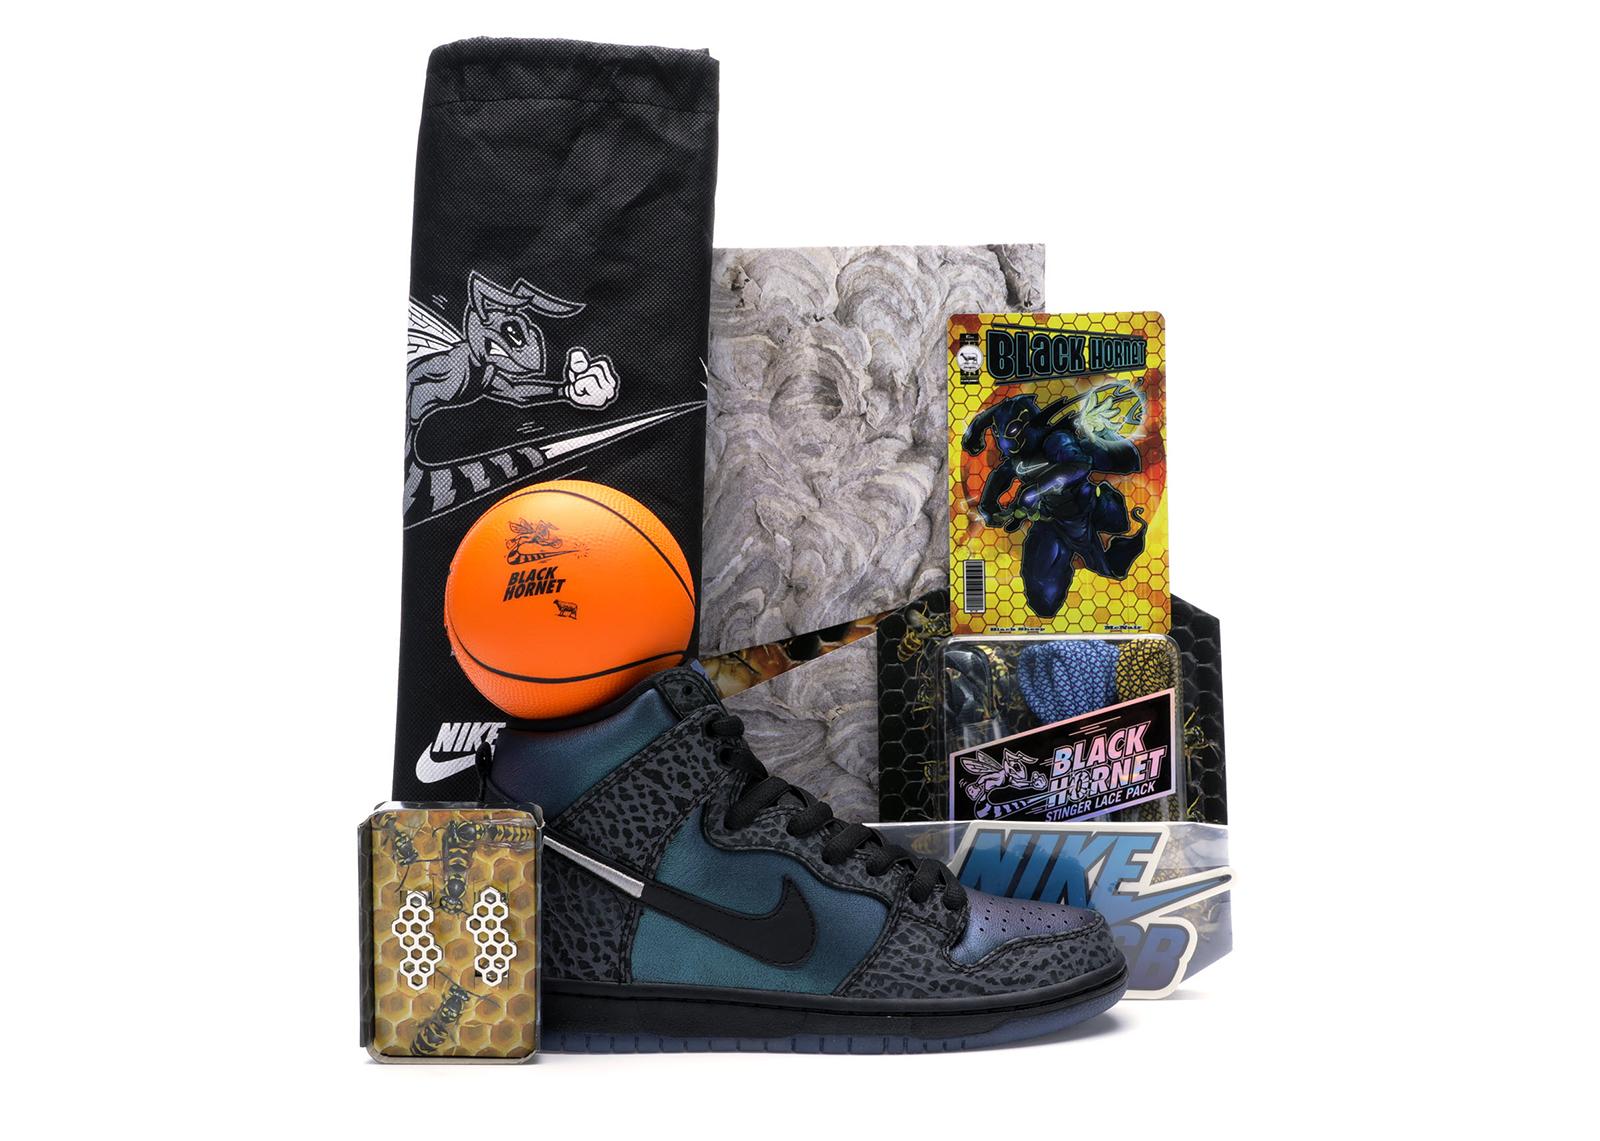 Nike SB Dunk High Black Sheep Hornet